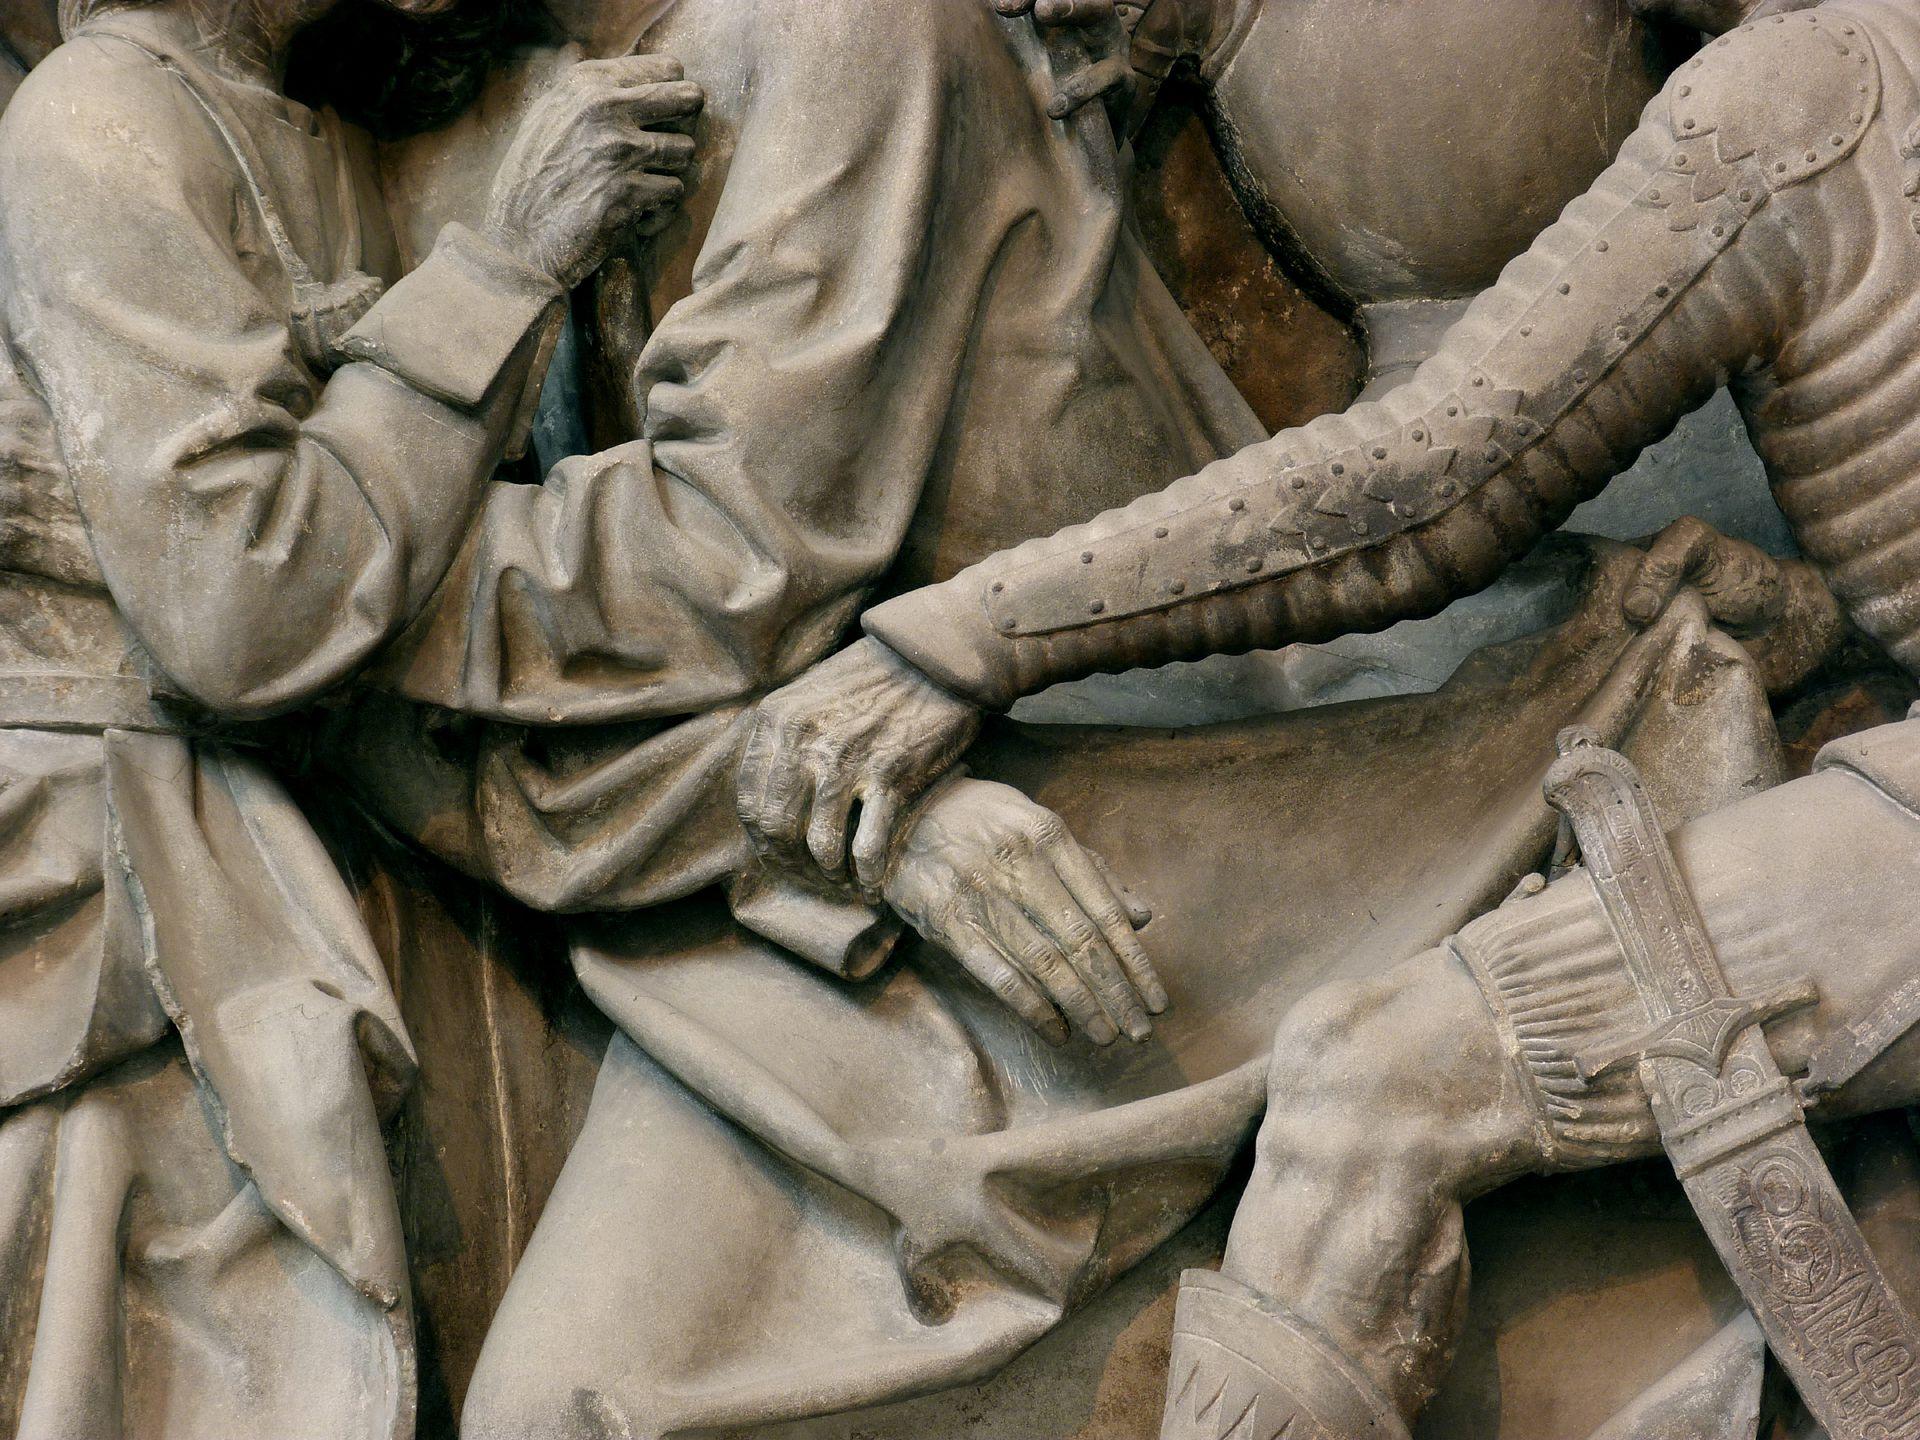 Volckamer Memorial Foundation, relief plates Arrest, detail: Hands